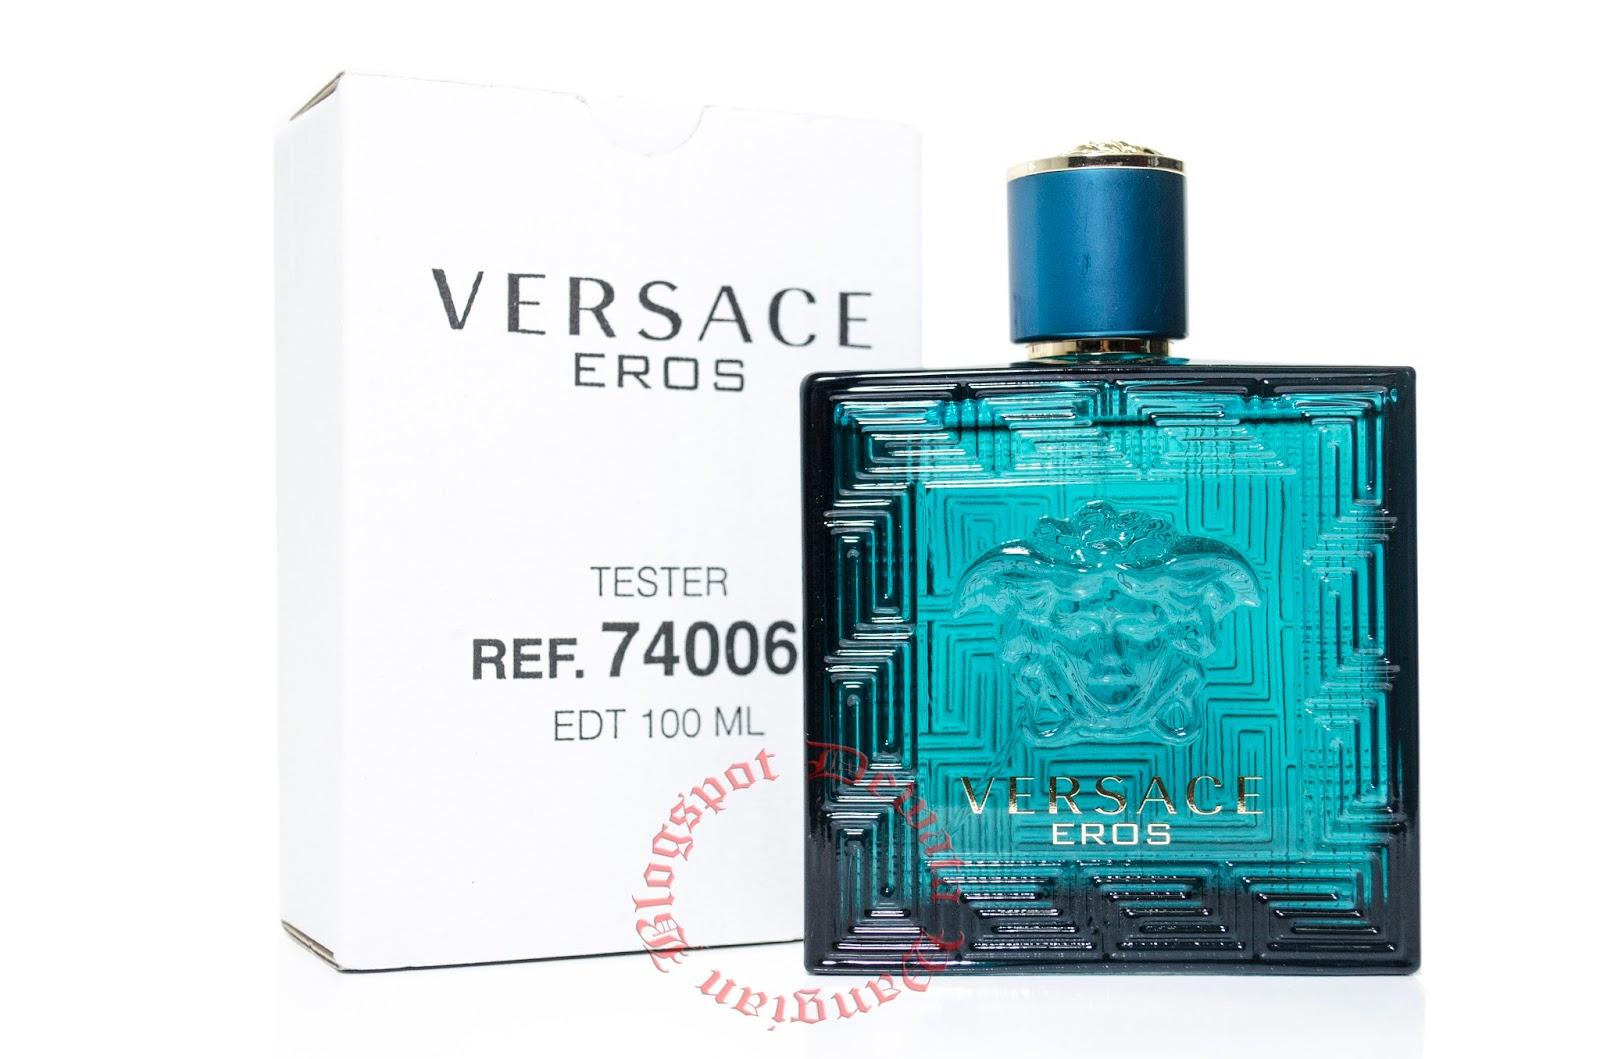 Wangianperfume Cosmetic Original Terbaik Versace Eros Tester Perfume